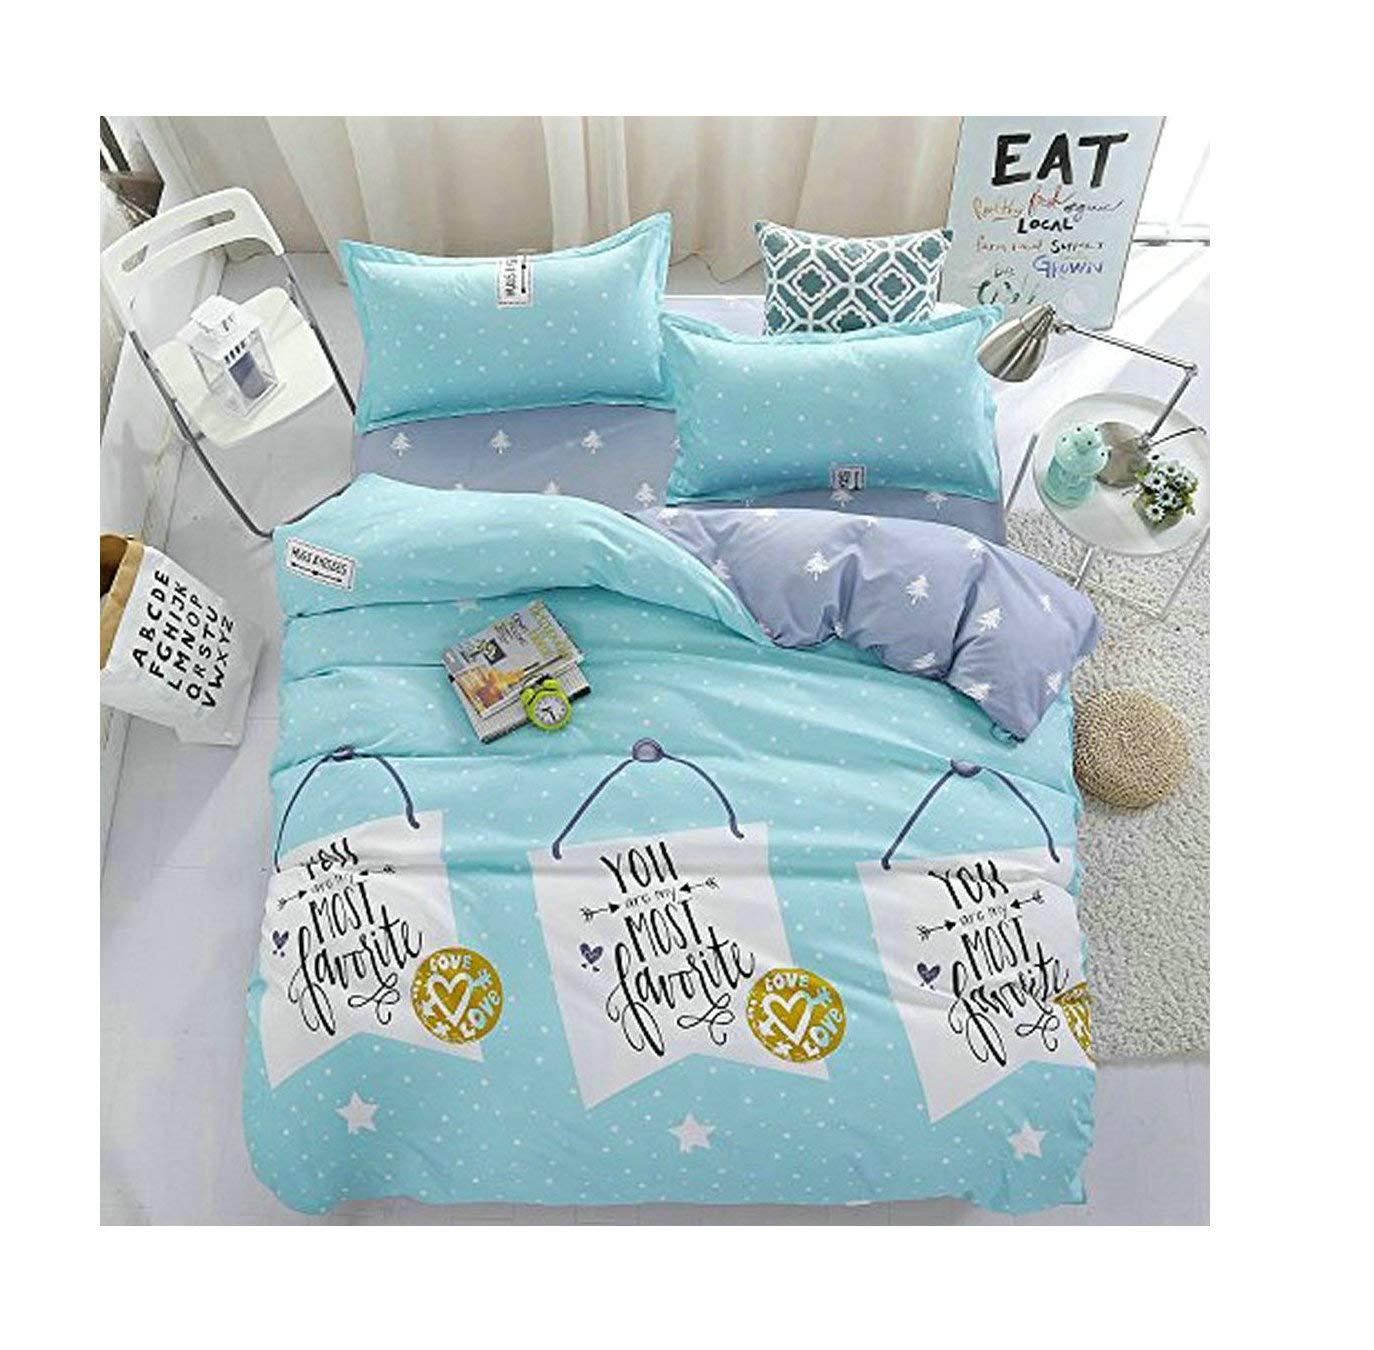 KFZ Children Bedding Duvet Cover Flat Bedsheet Pillowcase 4pcs No Comforter JSD Twin Full Queen Princess Dream Daily Baby Love Favorite Holiday Designs (Baby Love, Blue, Twin, 59x78, 3pcs) 59x78